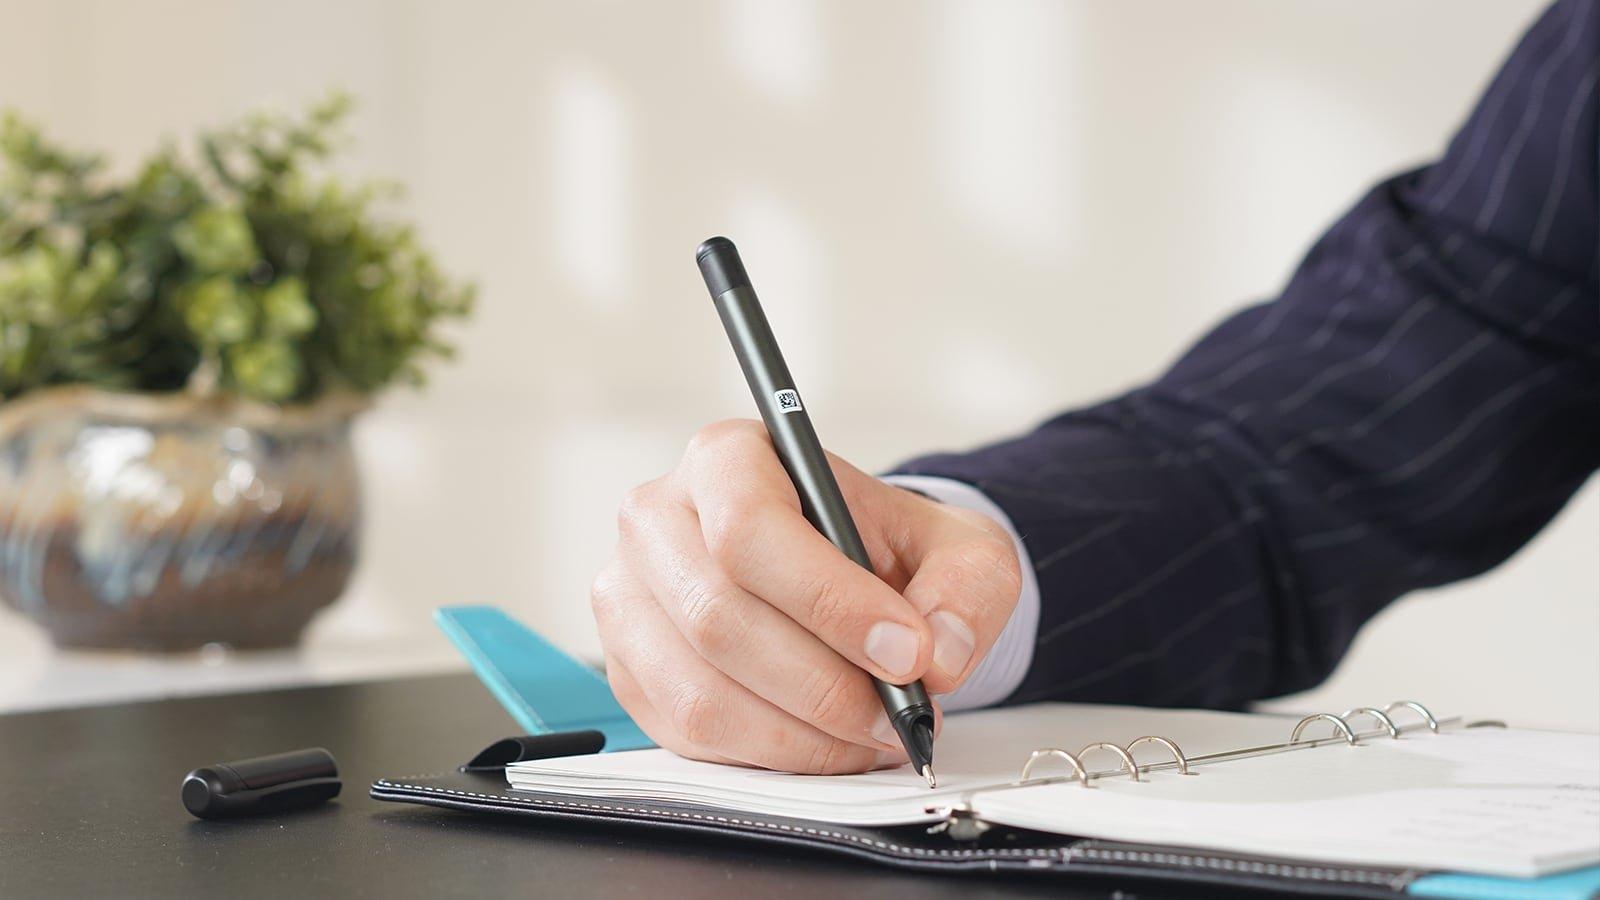 SyncPen 2nd Generation Smart Pen Writing System lets you take notes effortlessly